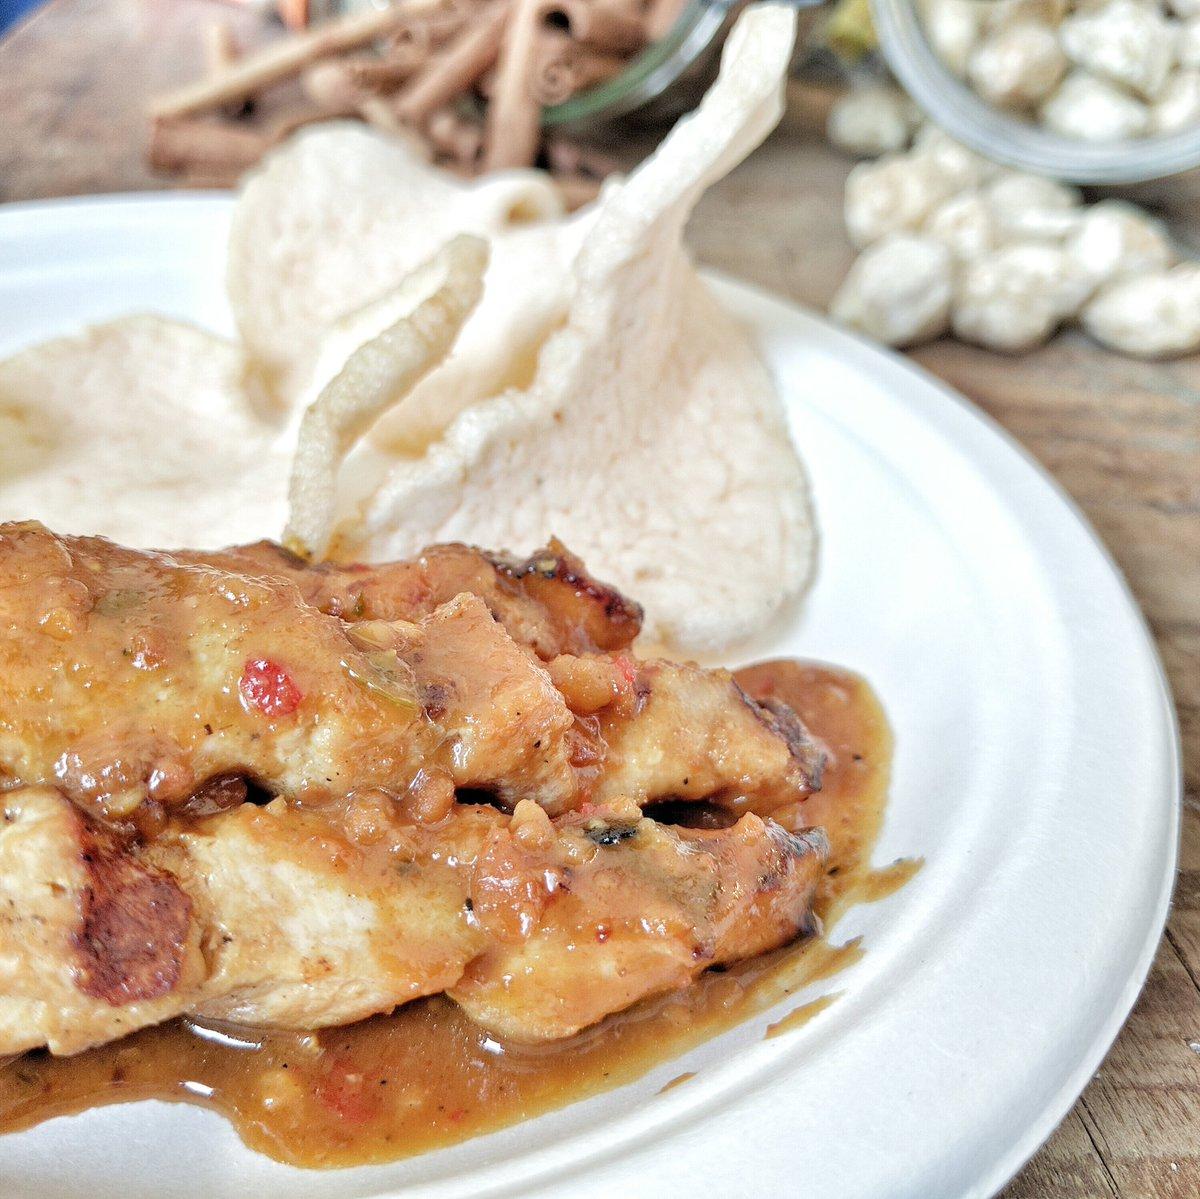 Satay Ayam from Little Sister Indonesia & Noorden Food Bar at Taste of Toronto